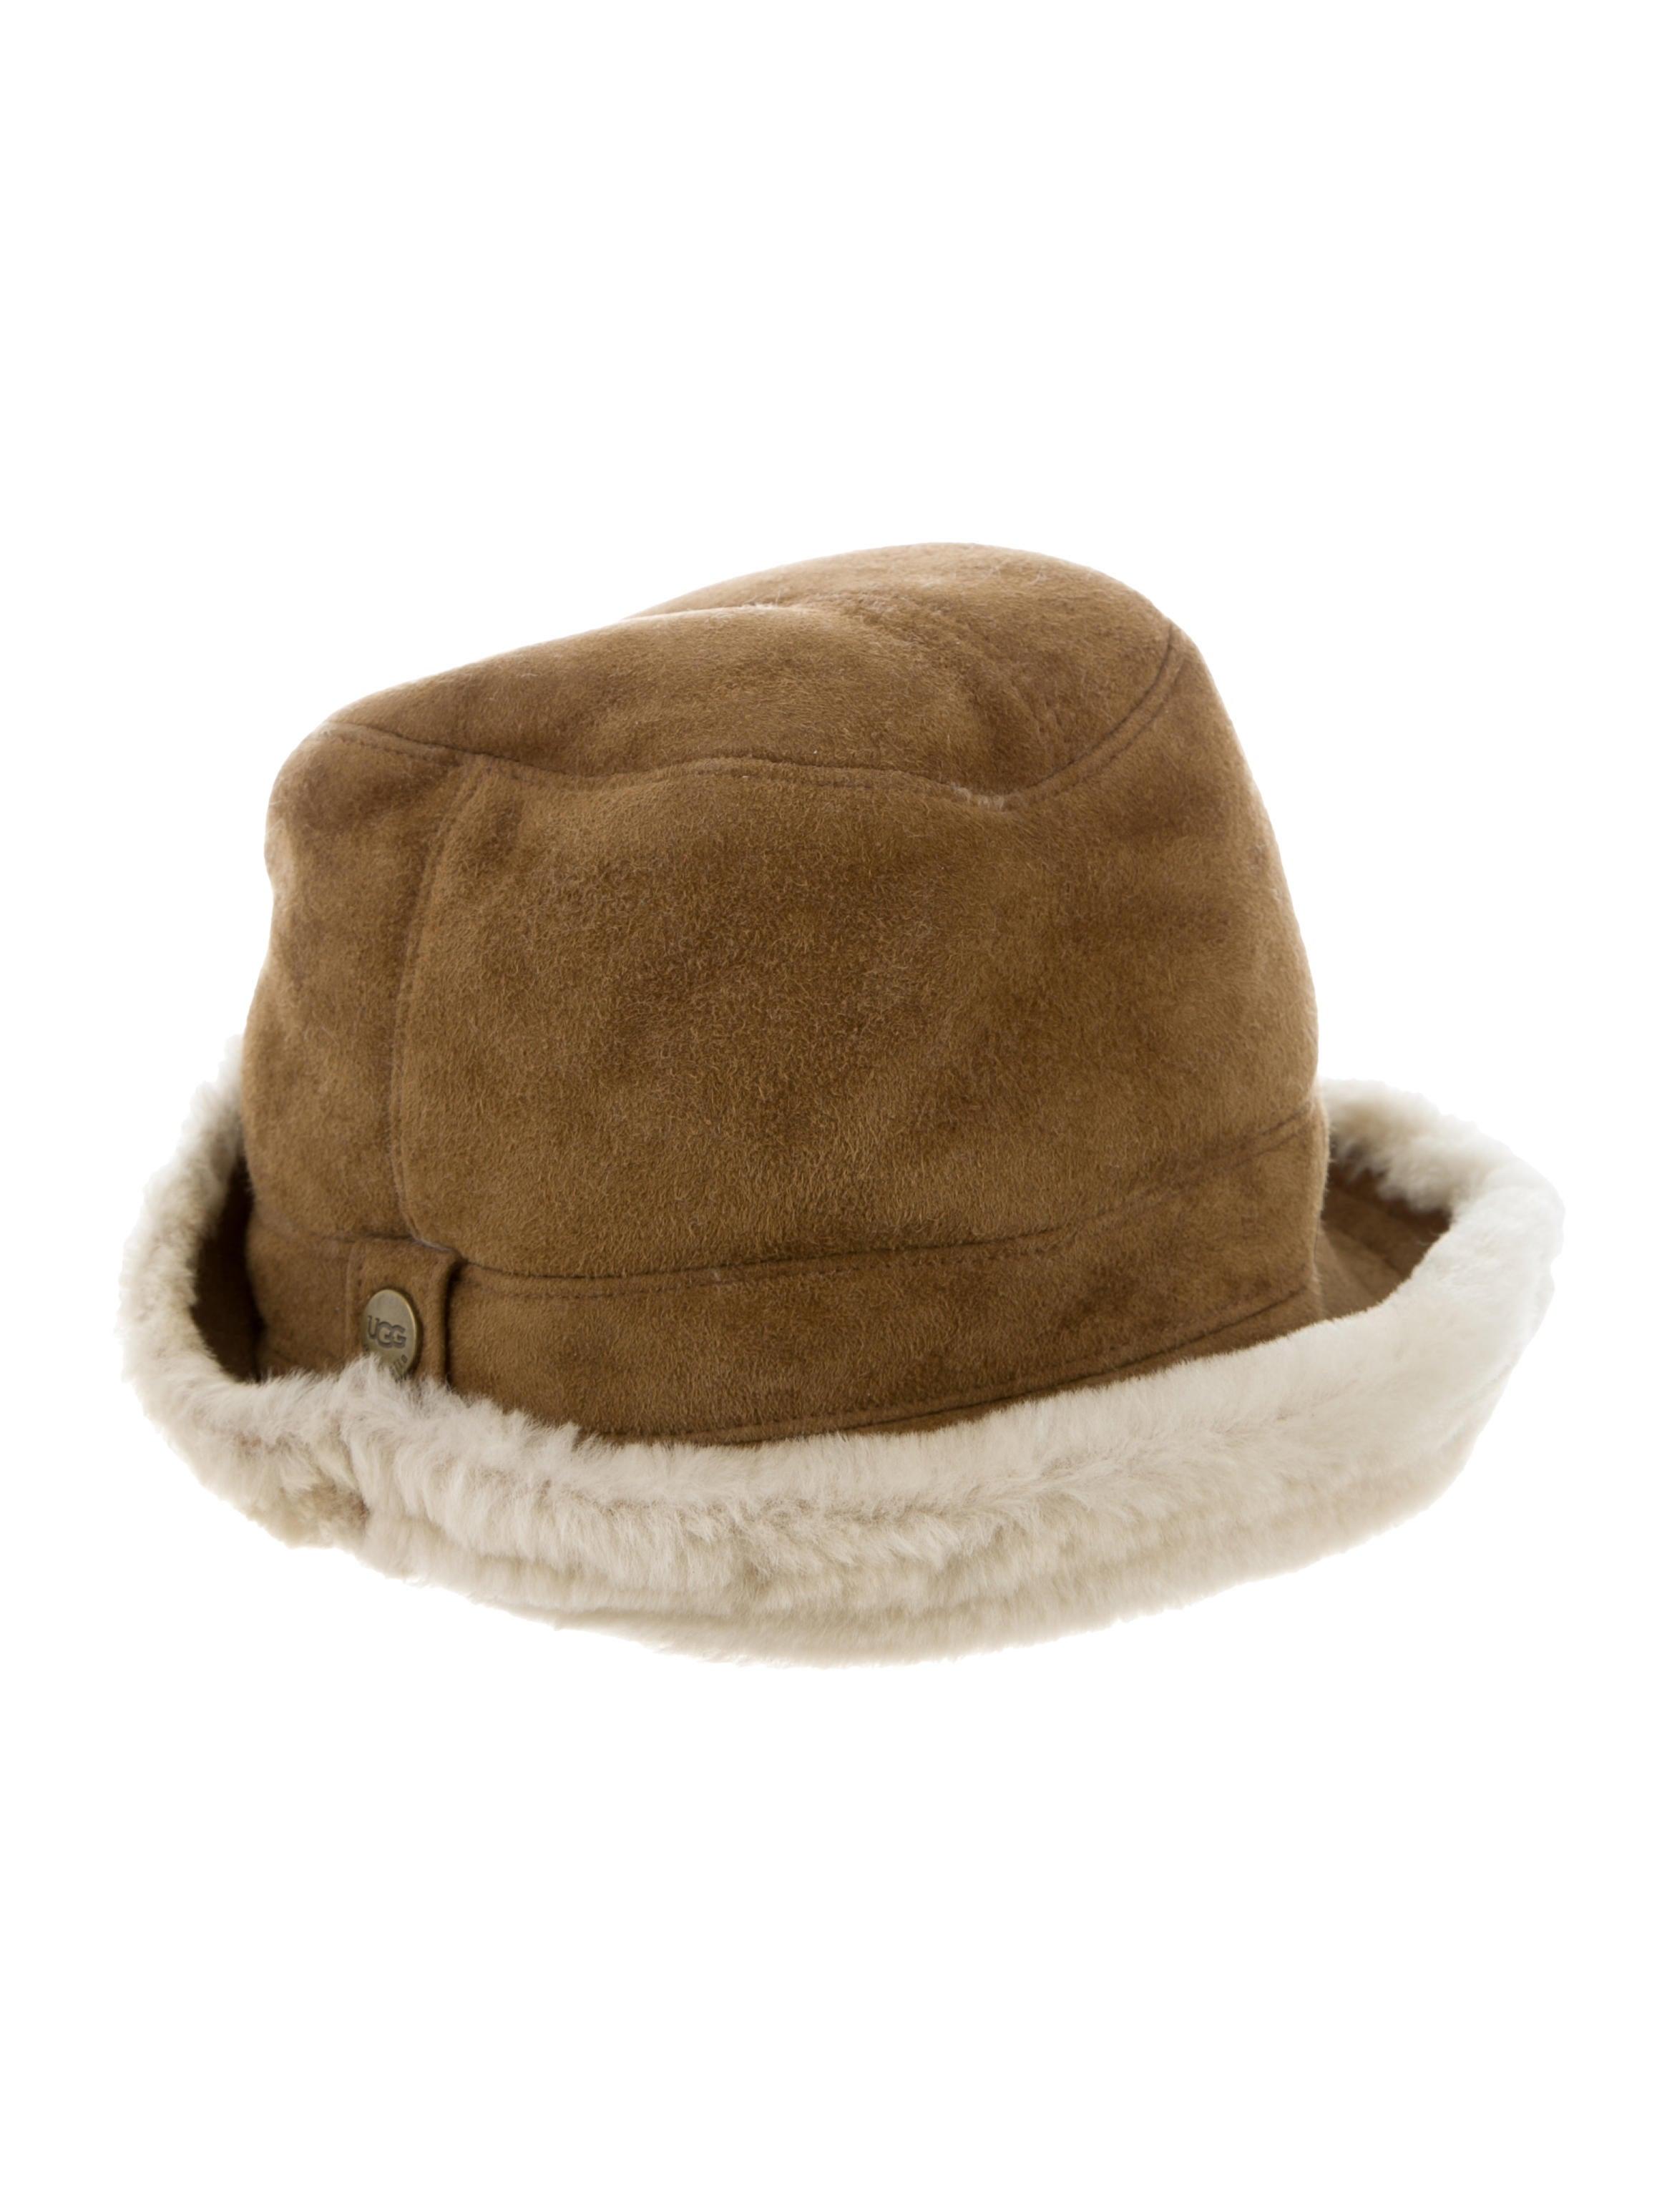 46fd0898 UGG Australia Shearling Bucket Hat - Accessories - WUUGG23347   The ...